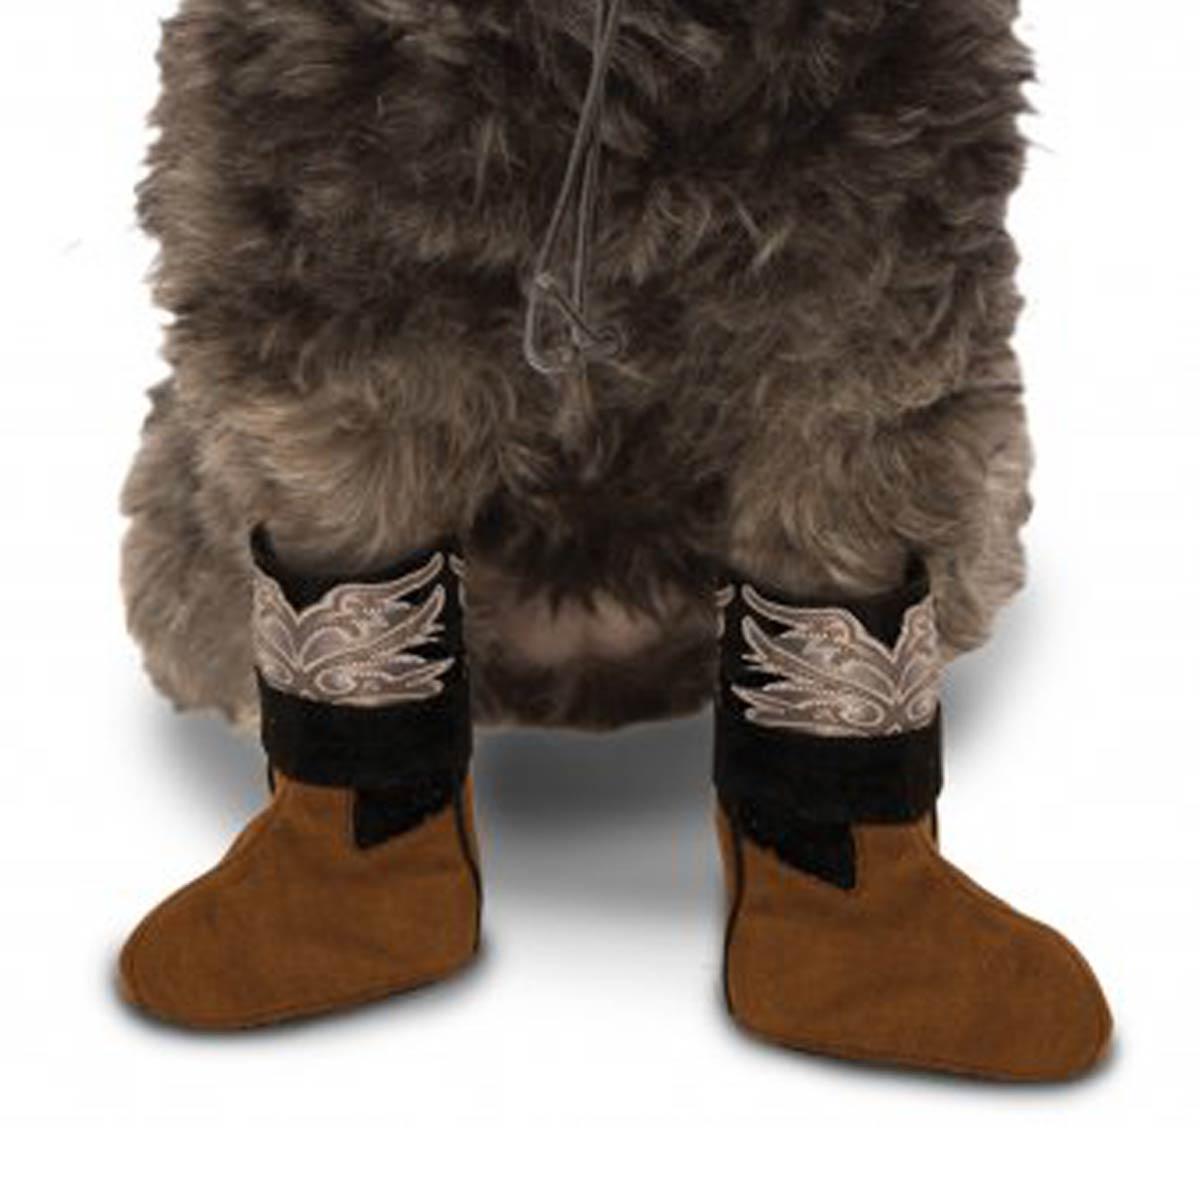 Cowboy Boot Cuff Dog Costume - Brown